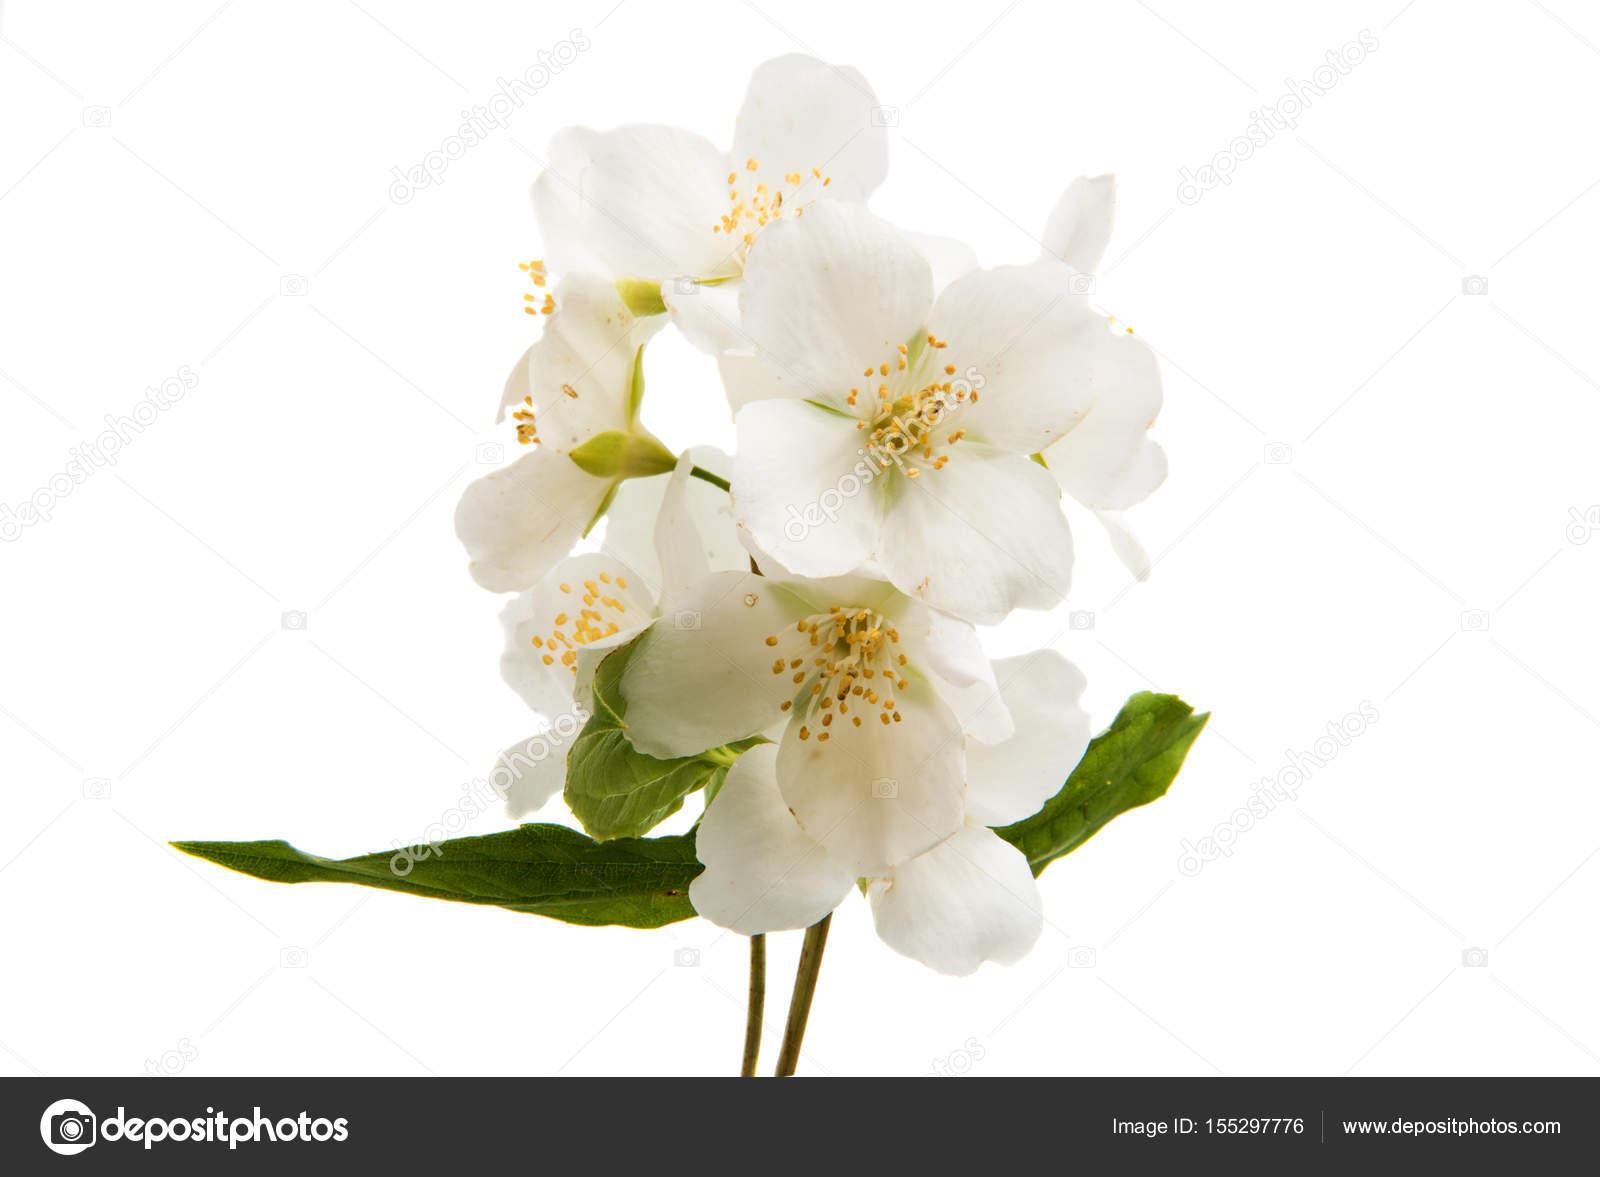 Bouquet jasmine flower stock photo ksena32 155297776 bouquet jasmine flower stock photo izmirmasajfo